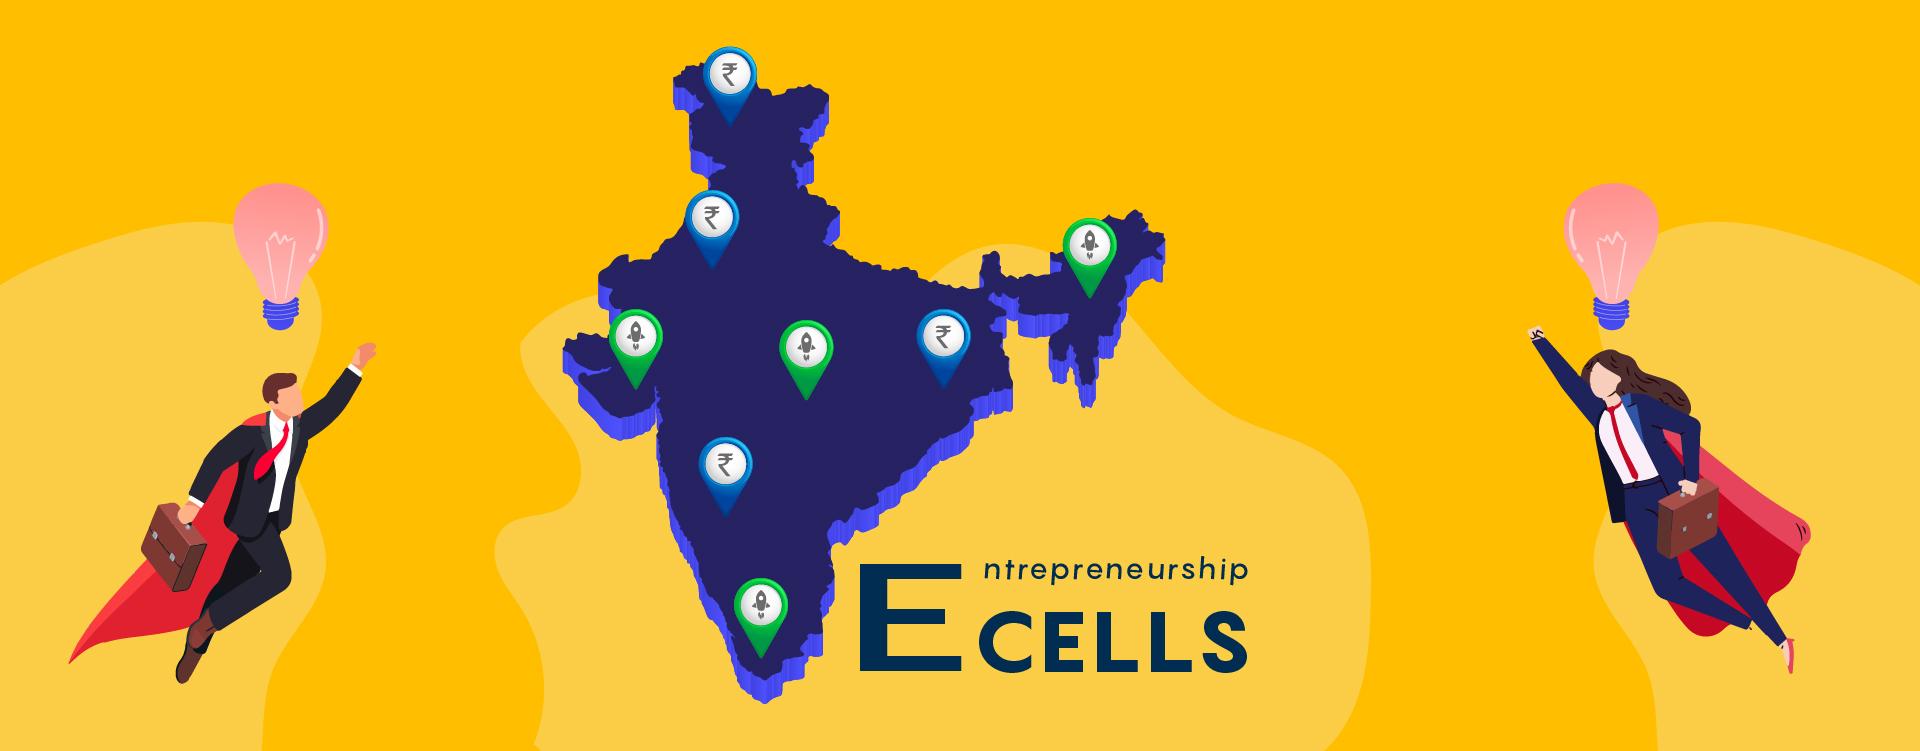 E-cells in India - successful start-ups